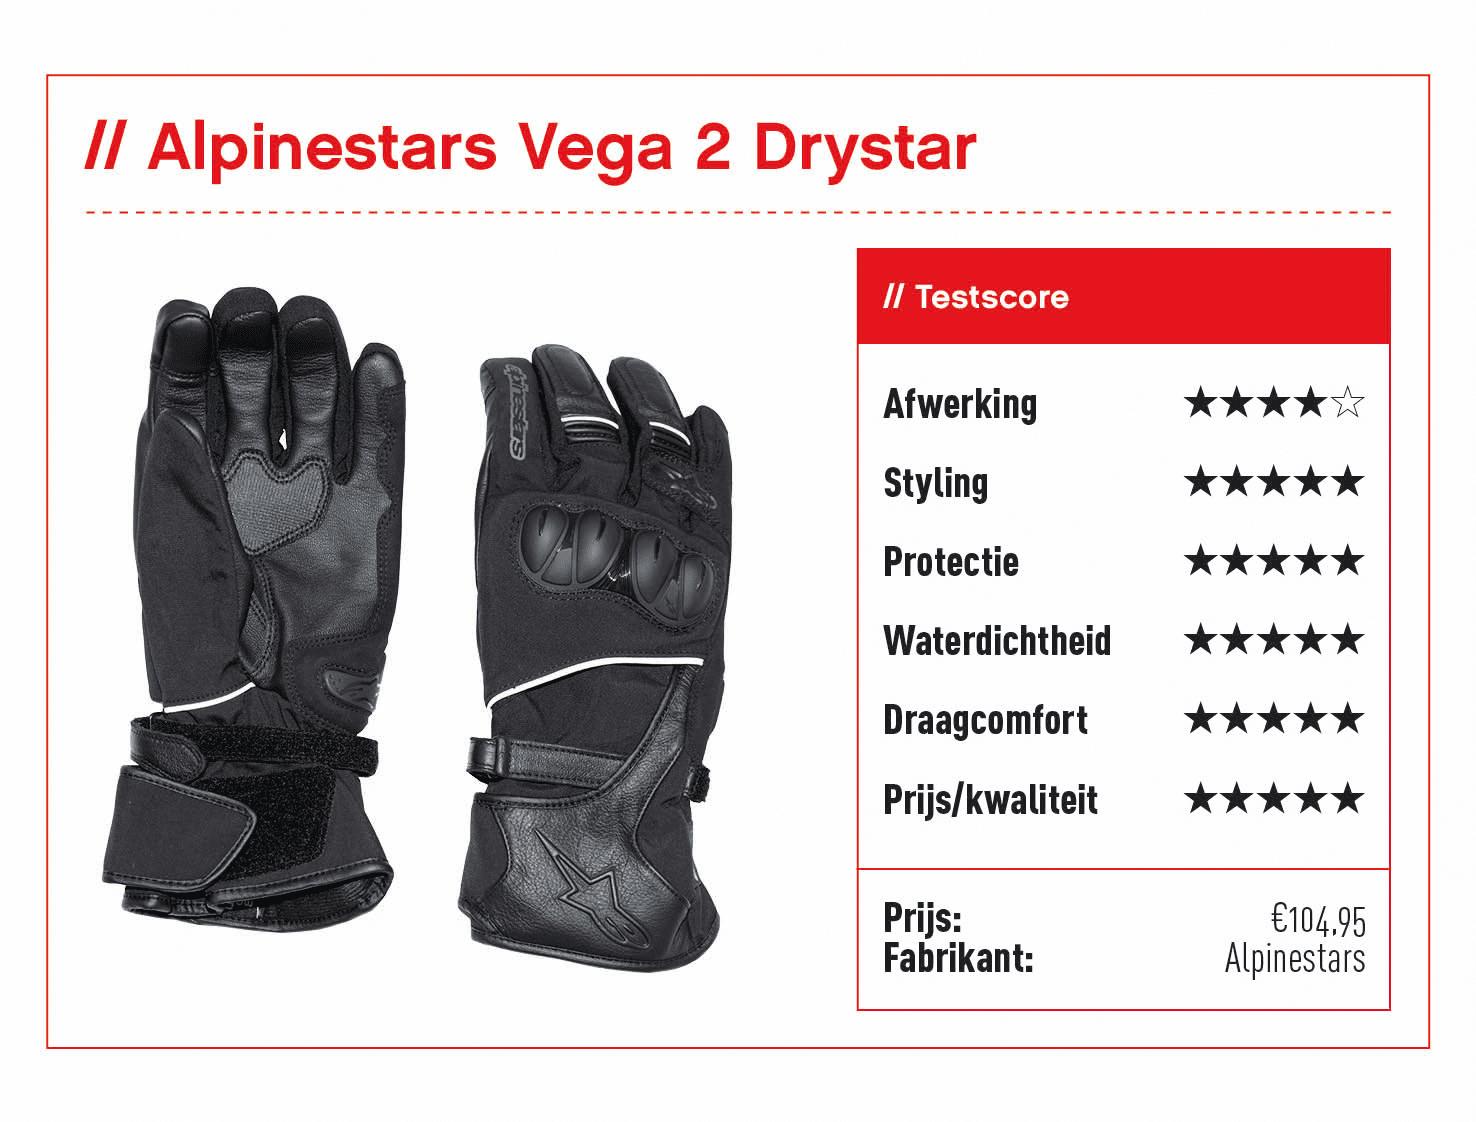 Alpinestars Vega 2 Drystar met score